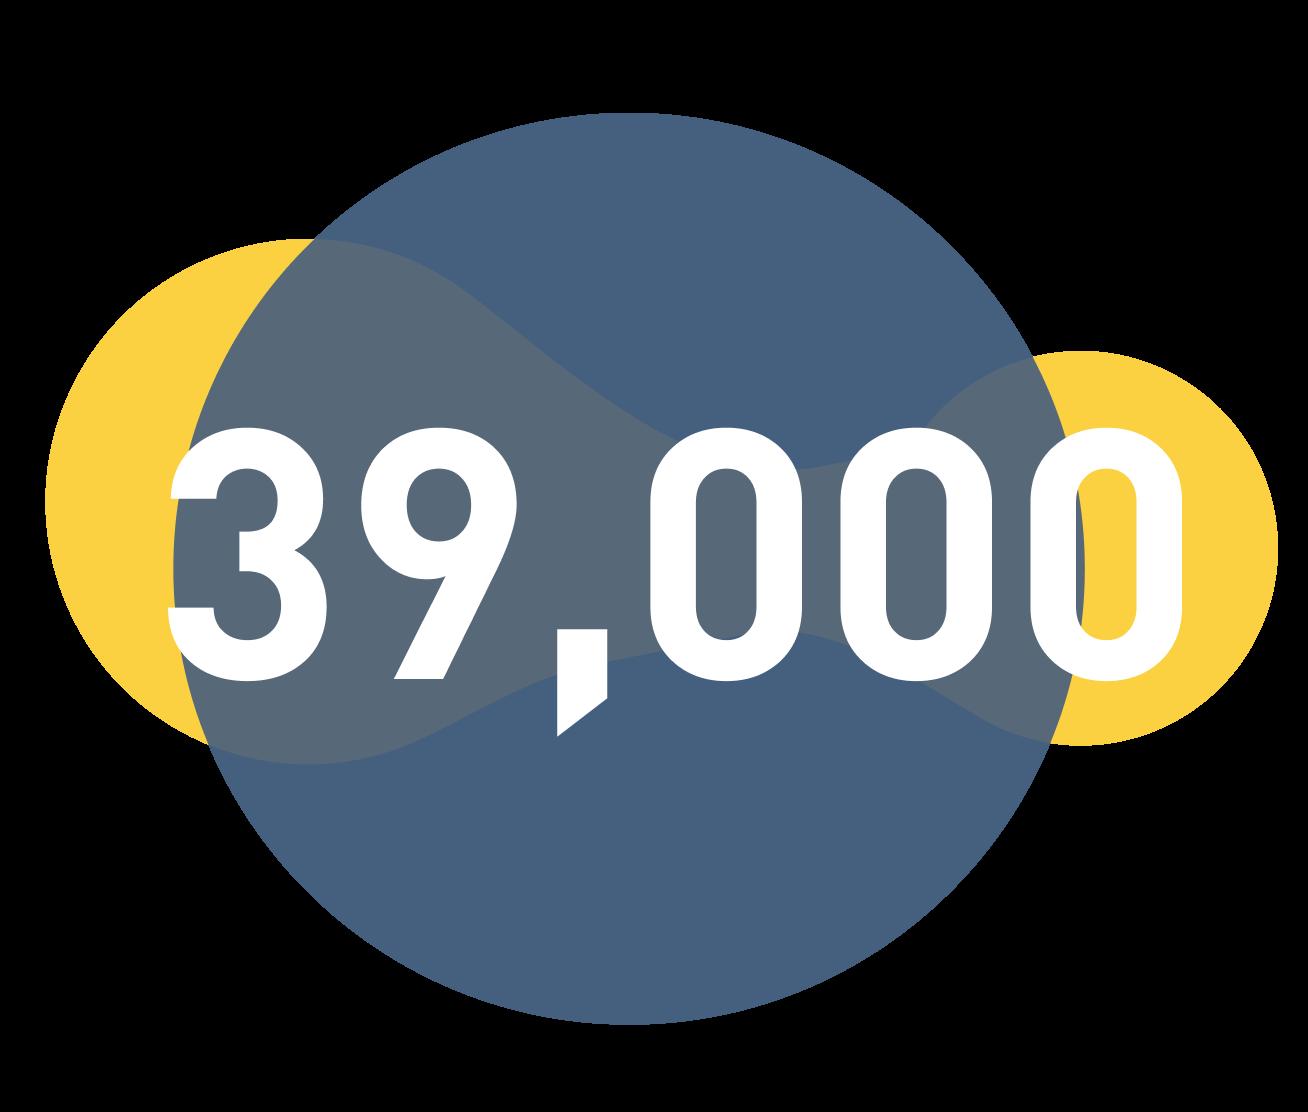 39,000 icon - gini